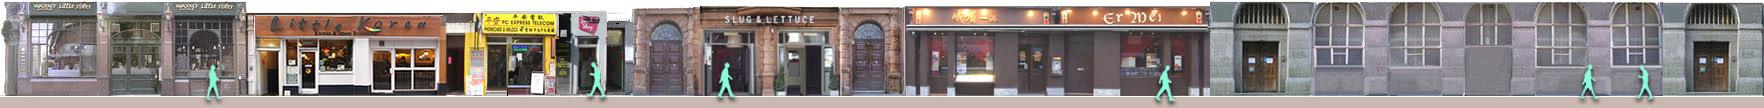 Lisle Street shops and restaurants